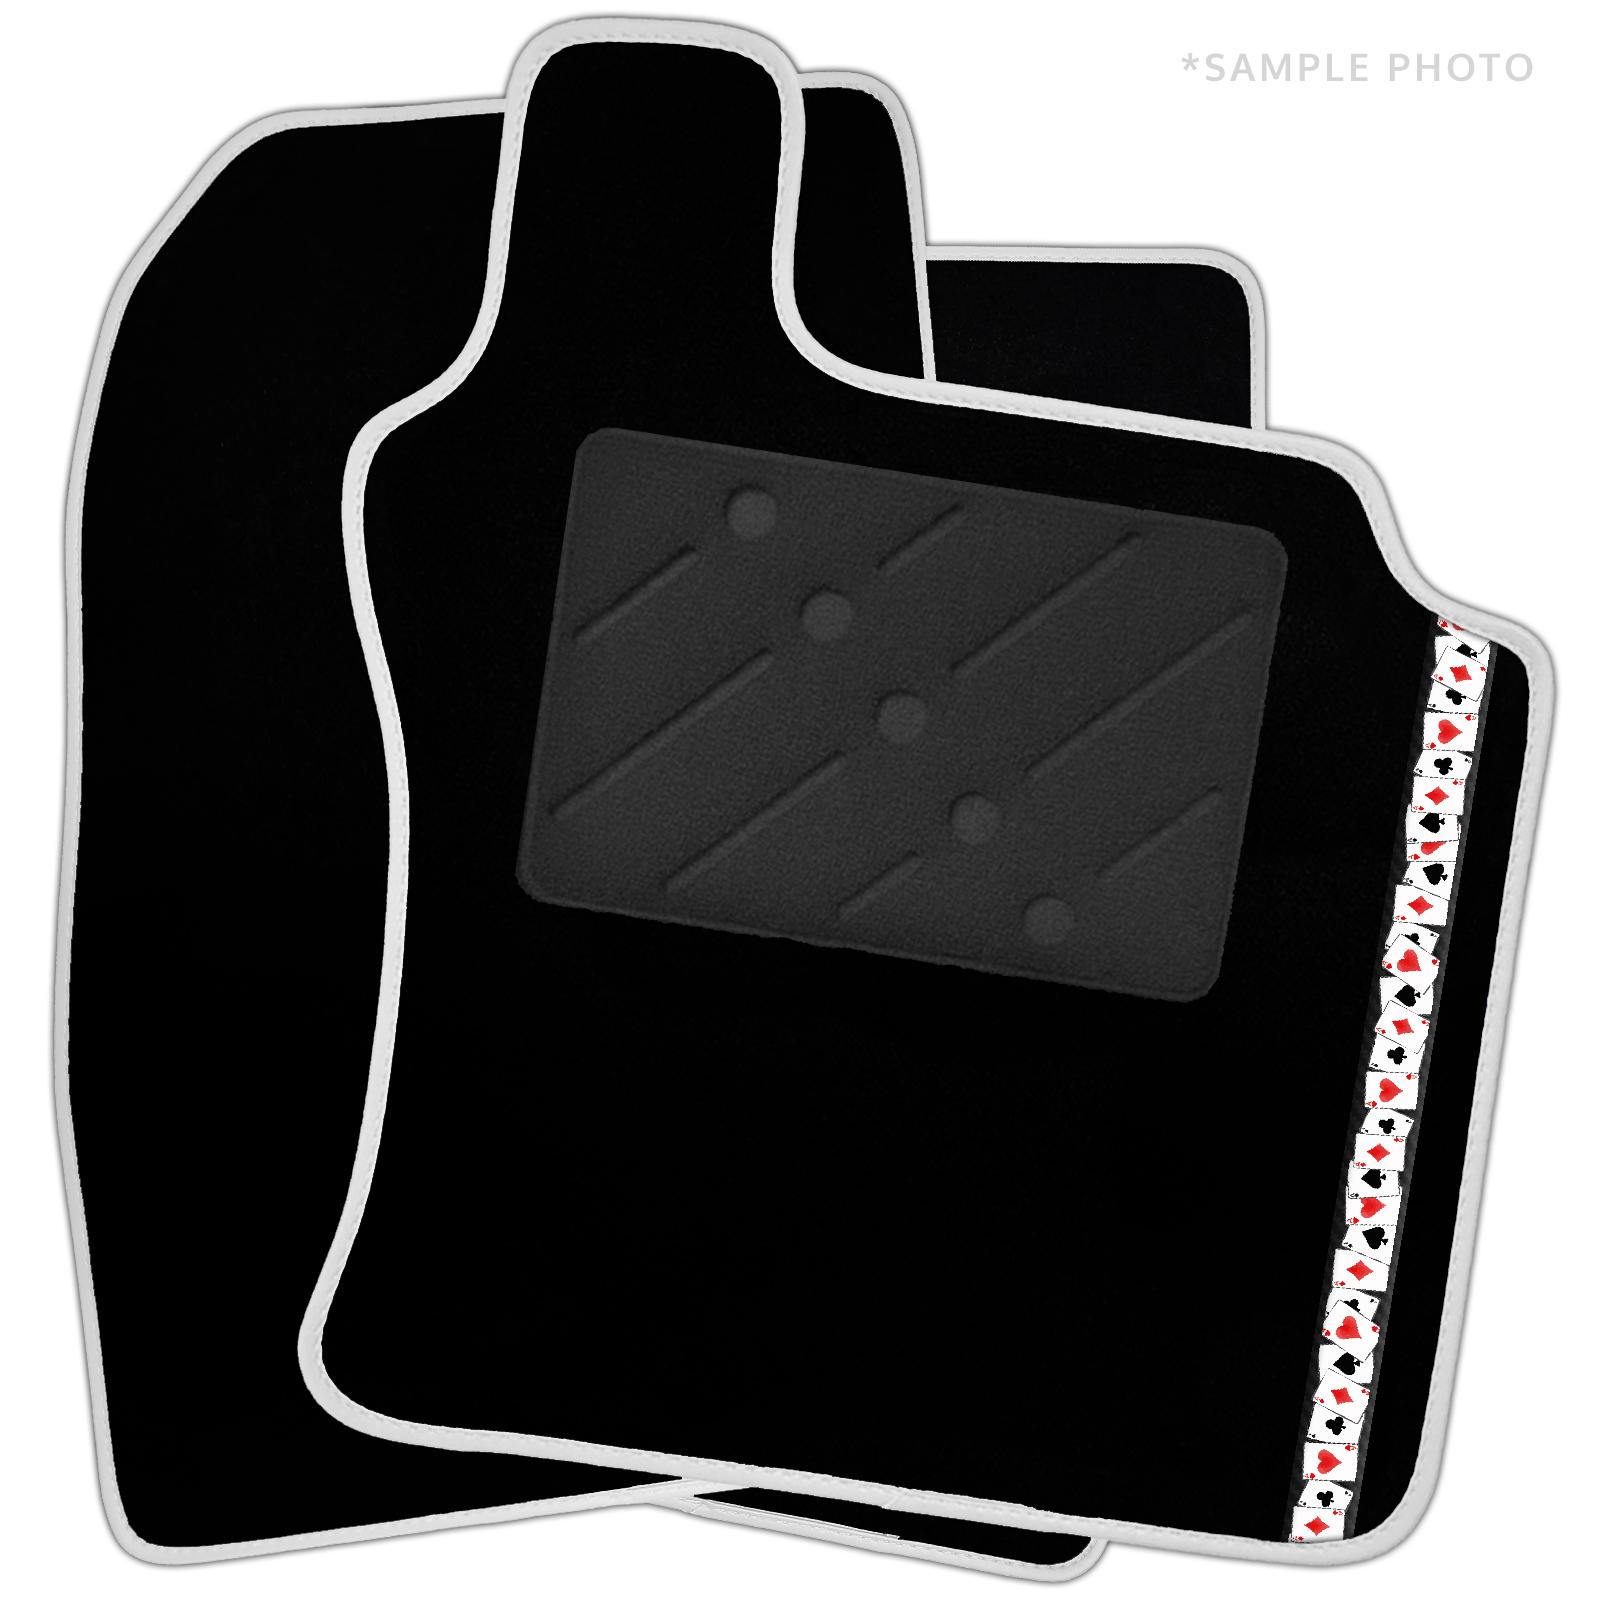 Maxus logo clipart graphic black and white Details about Ldv Maxus (2008+) Black Car Mats & Retro Logo graphic black and white